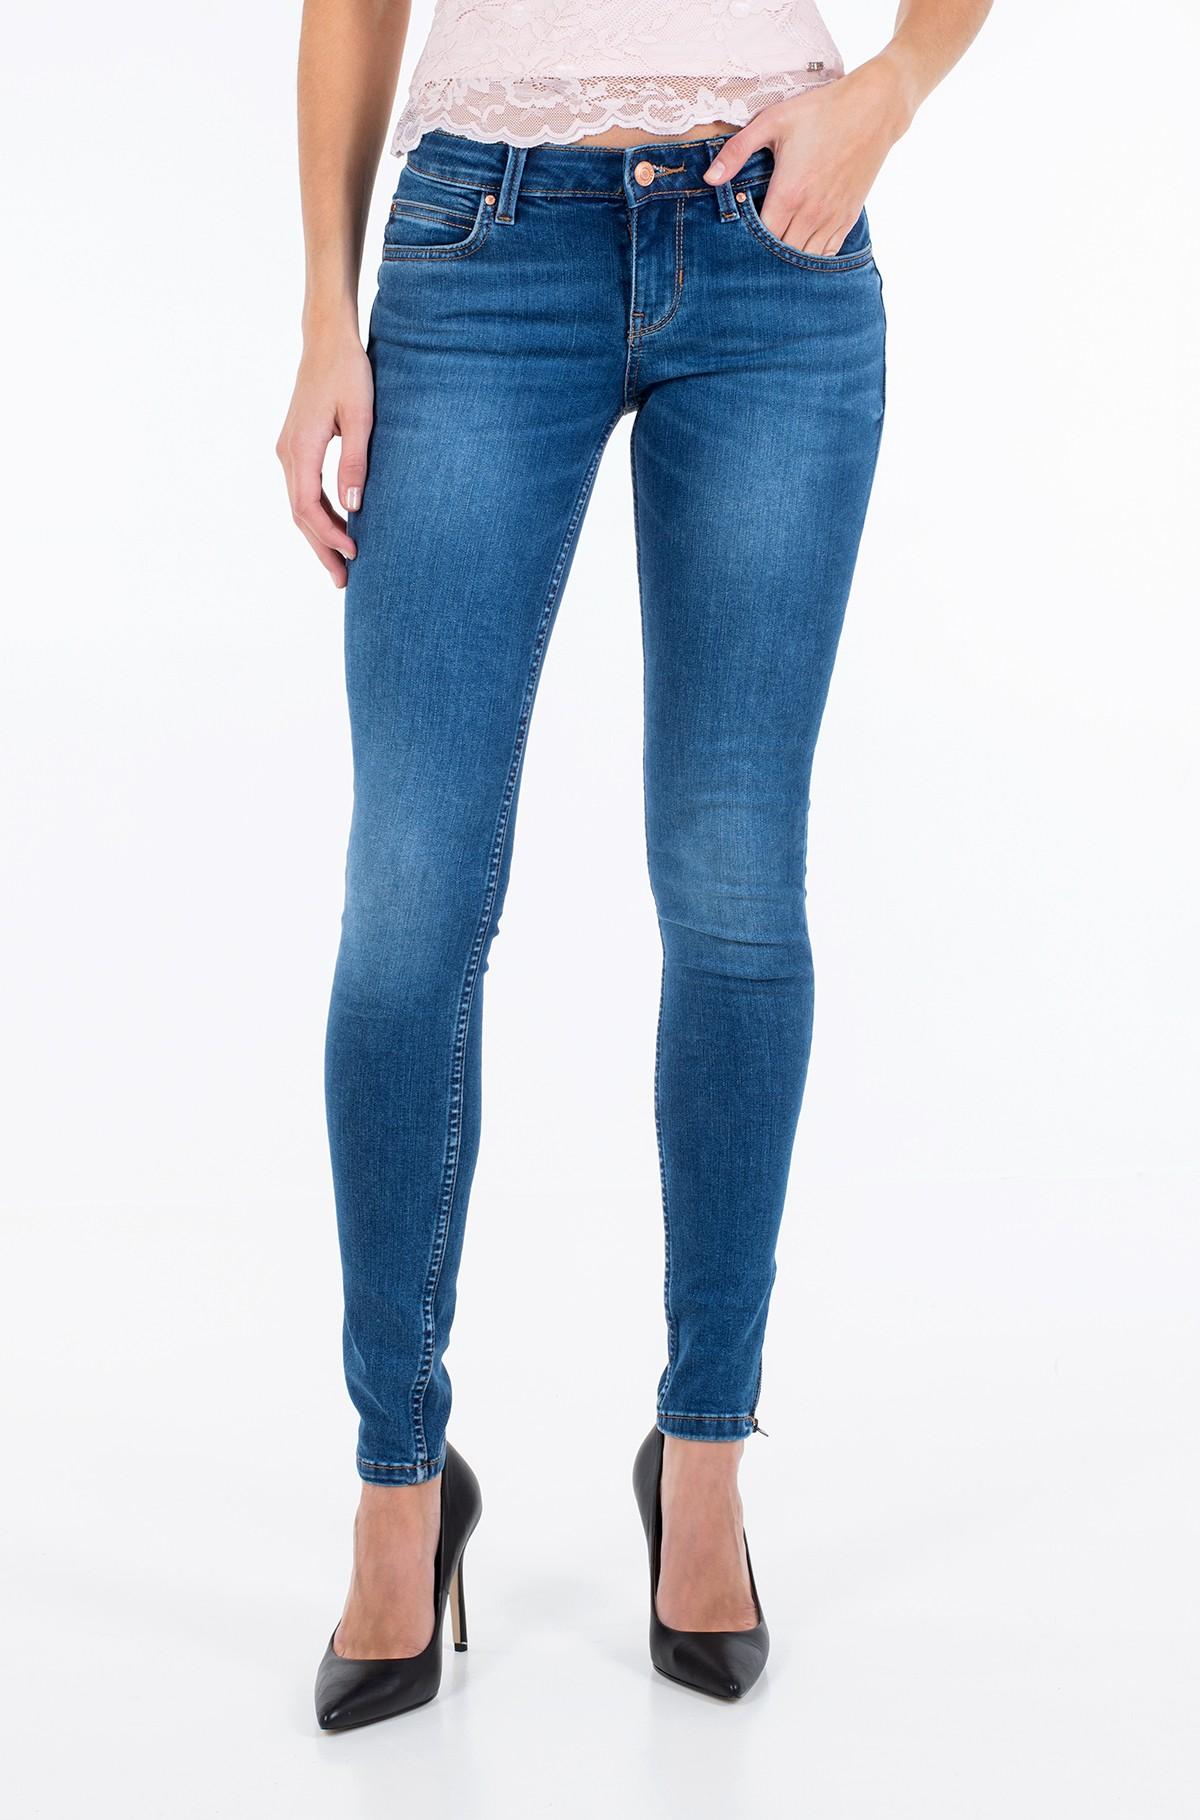 Jeans W0YAB8 D4484-full-1